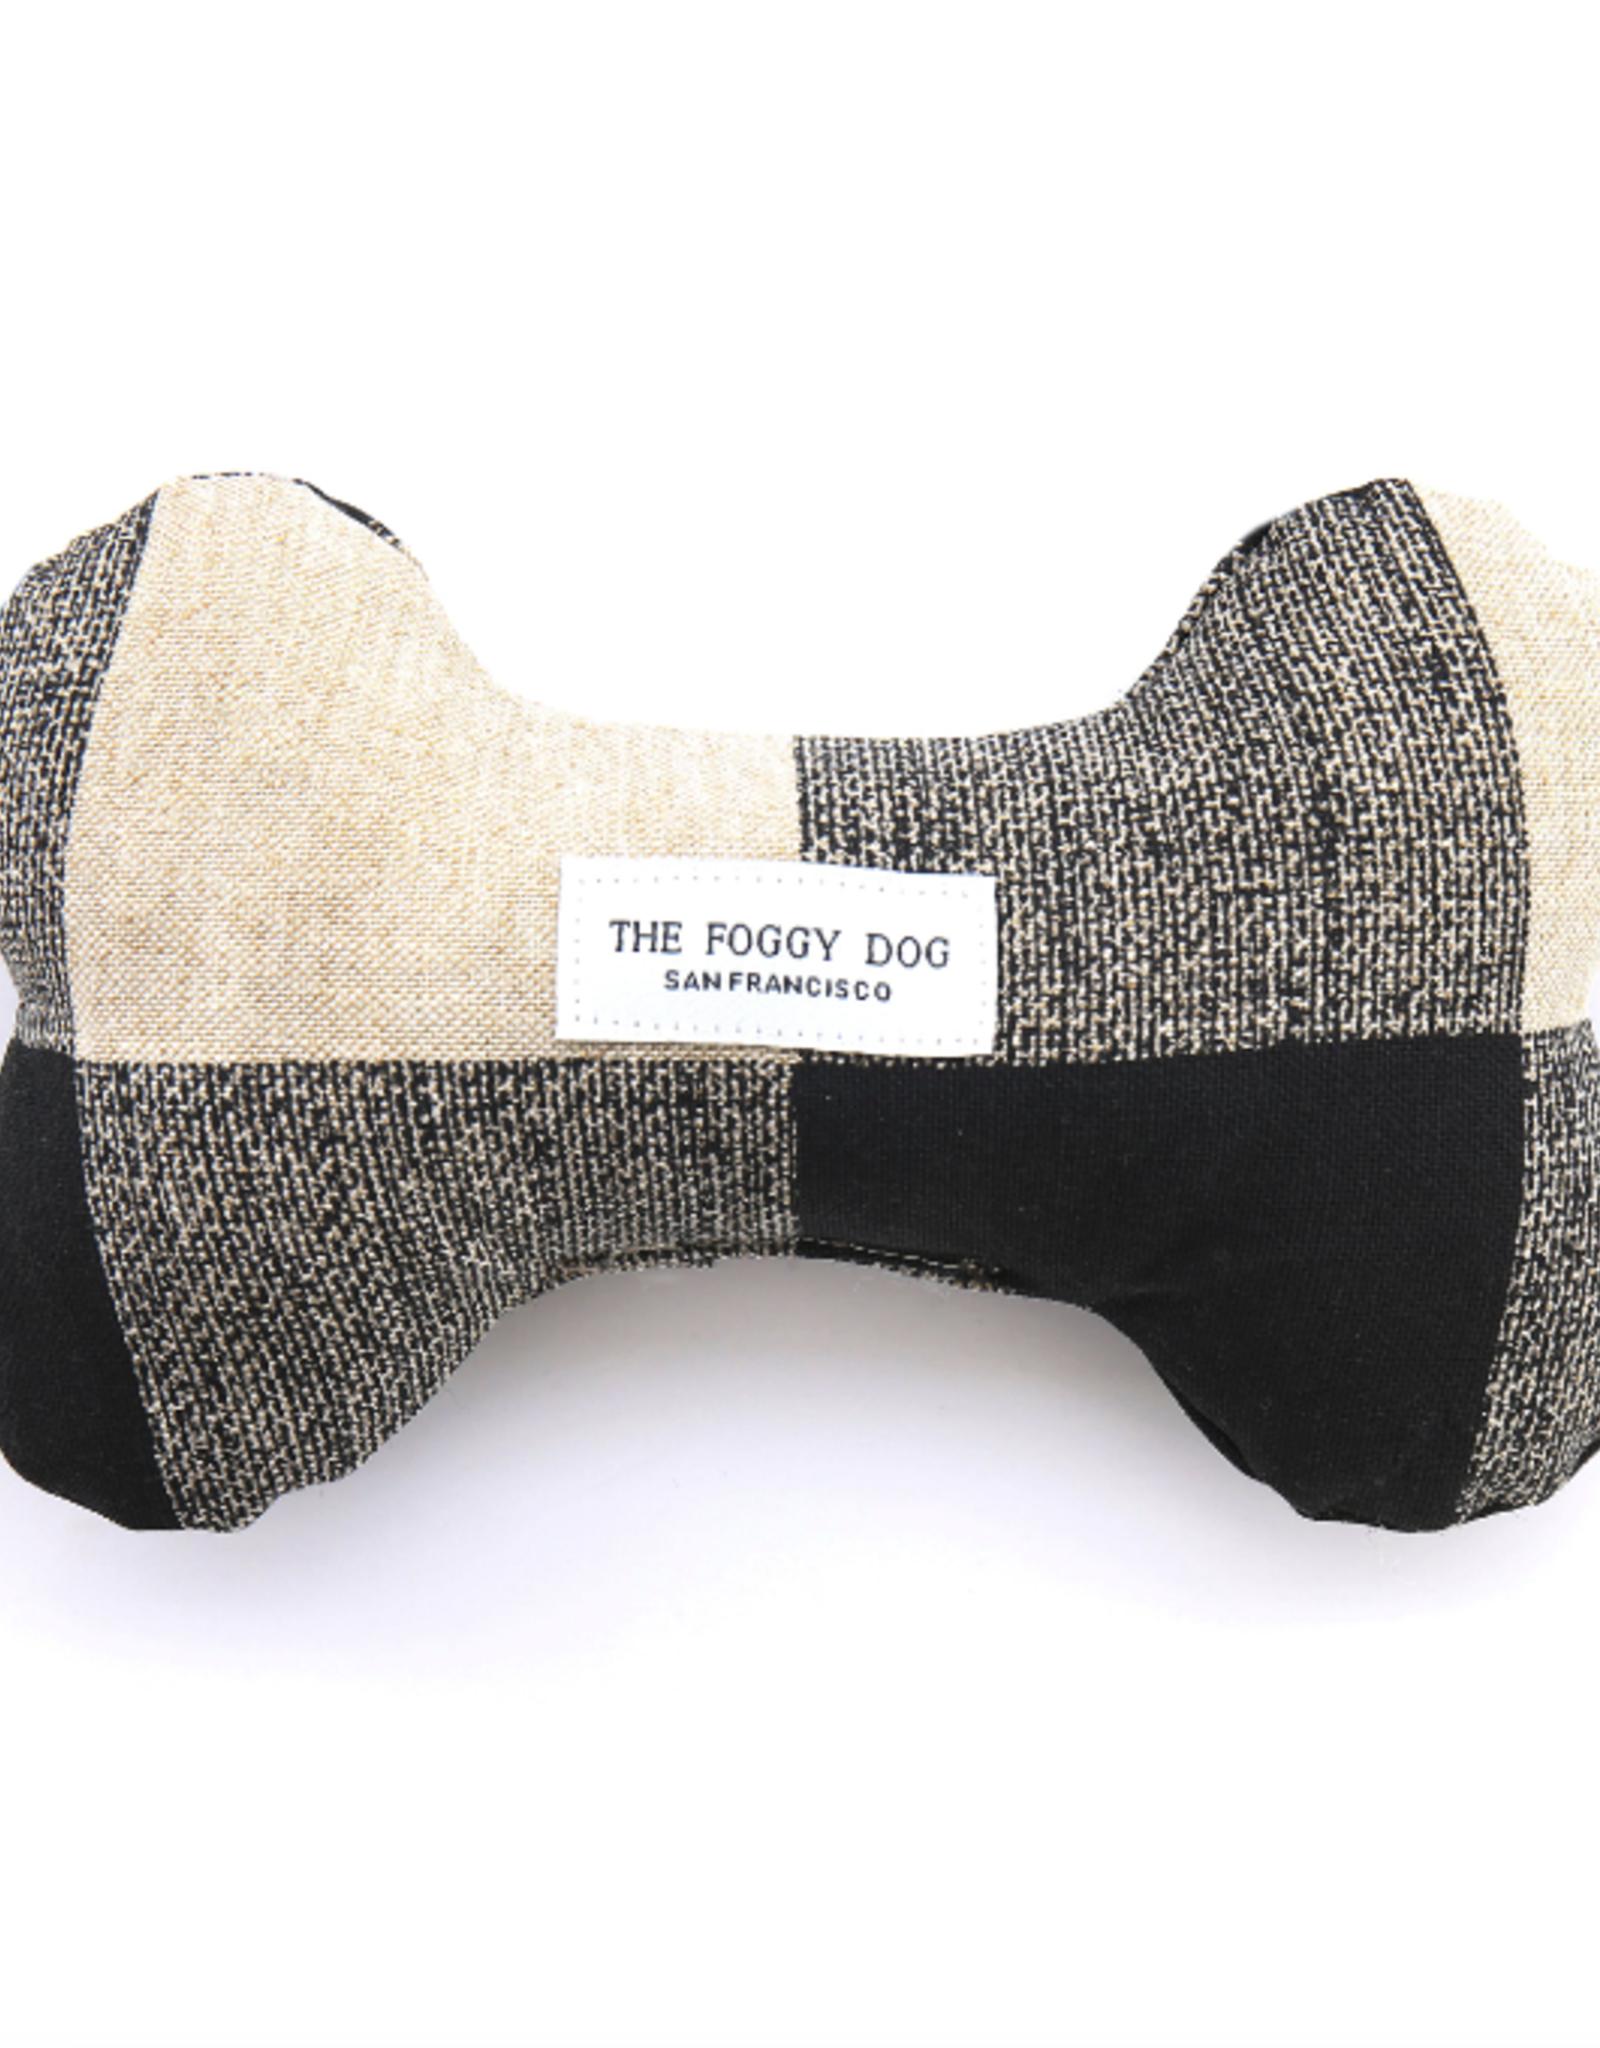 Buffalo Check Dog Bone Squeaky Toy